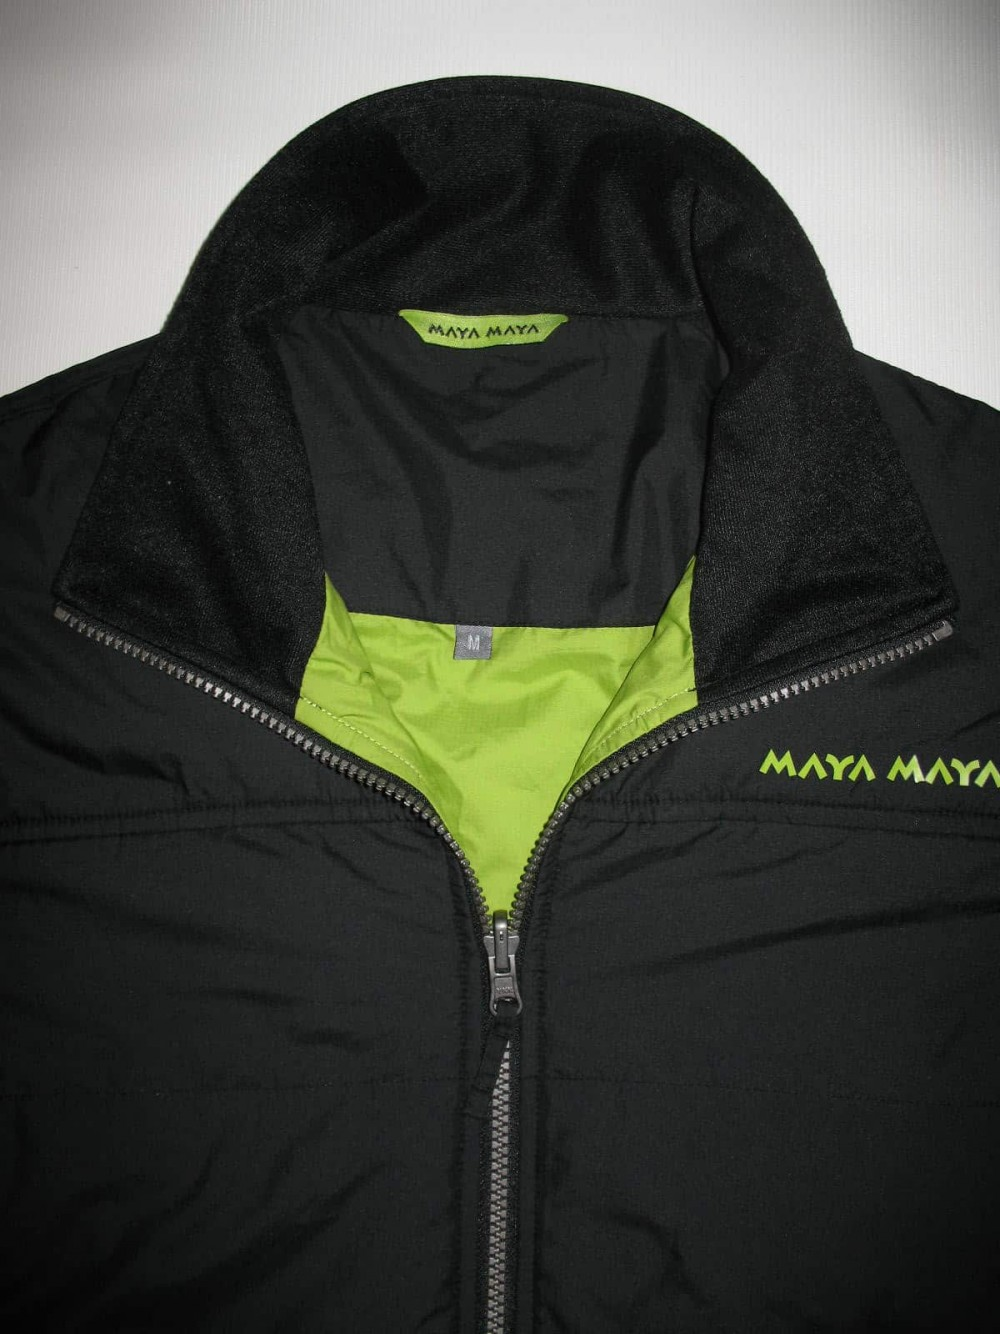 Куртка MAYA MAYA ultralight primaloft jacket (размер M) - 6